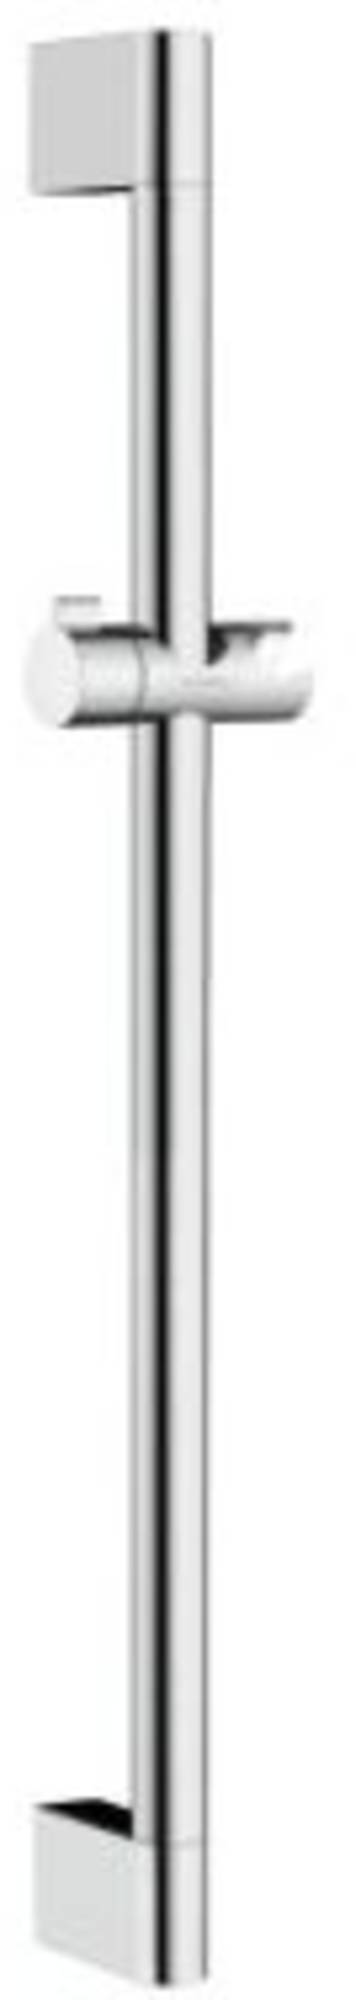 Hansgrohe Croma unica glijstang 65 cm. zonder doucheslang chroom